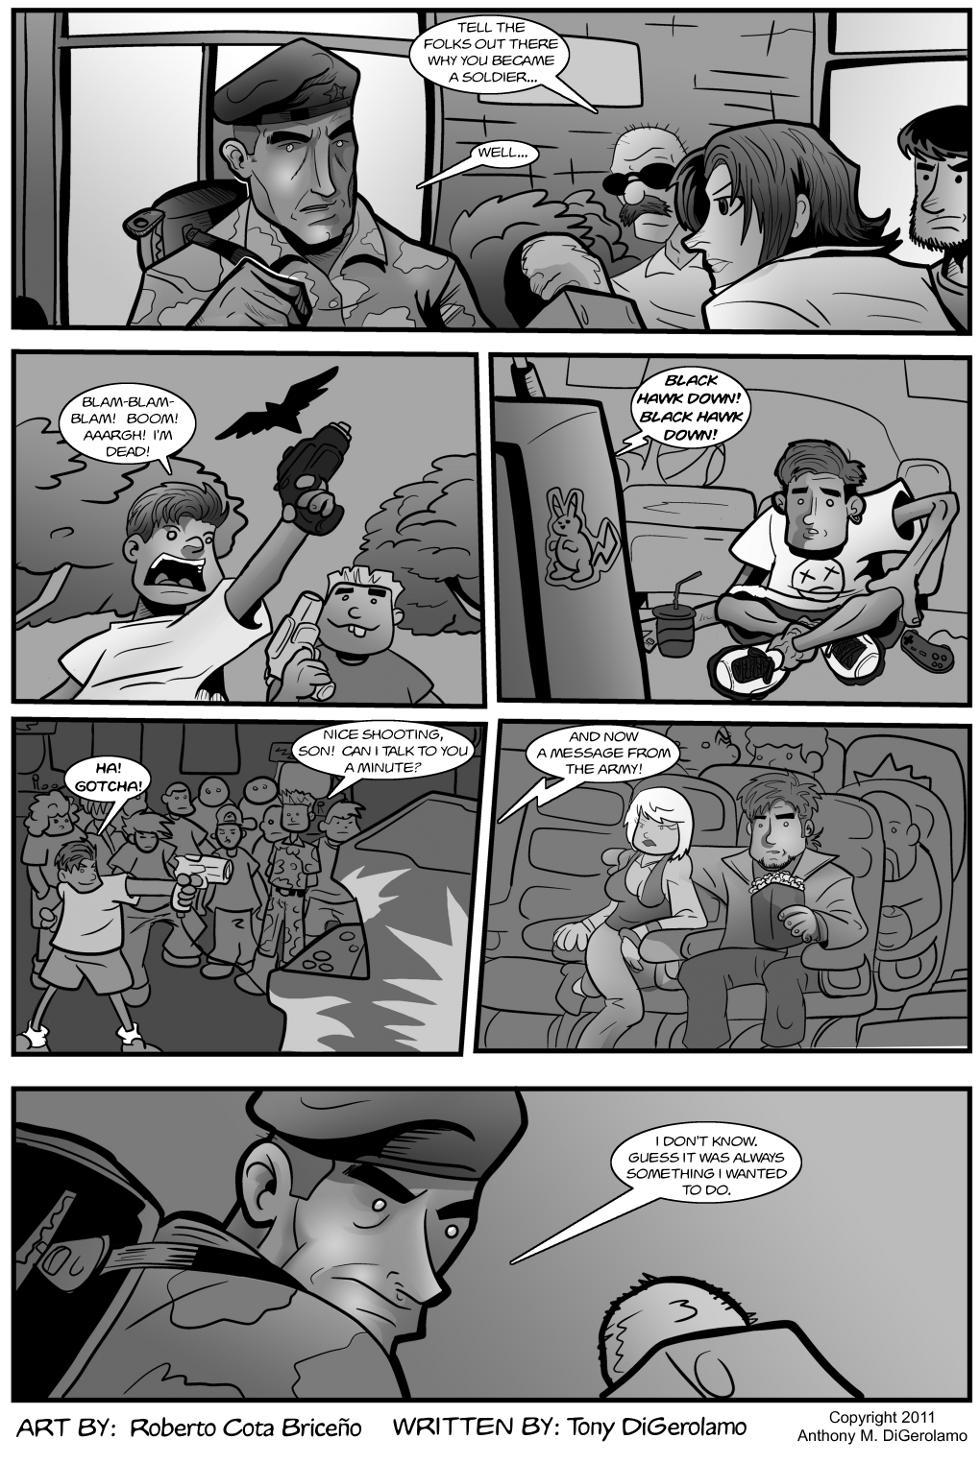 The Antiwar Comic:  No Reason